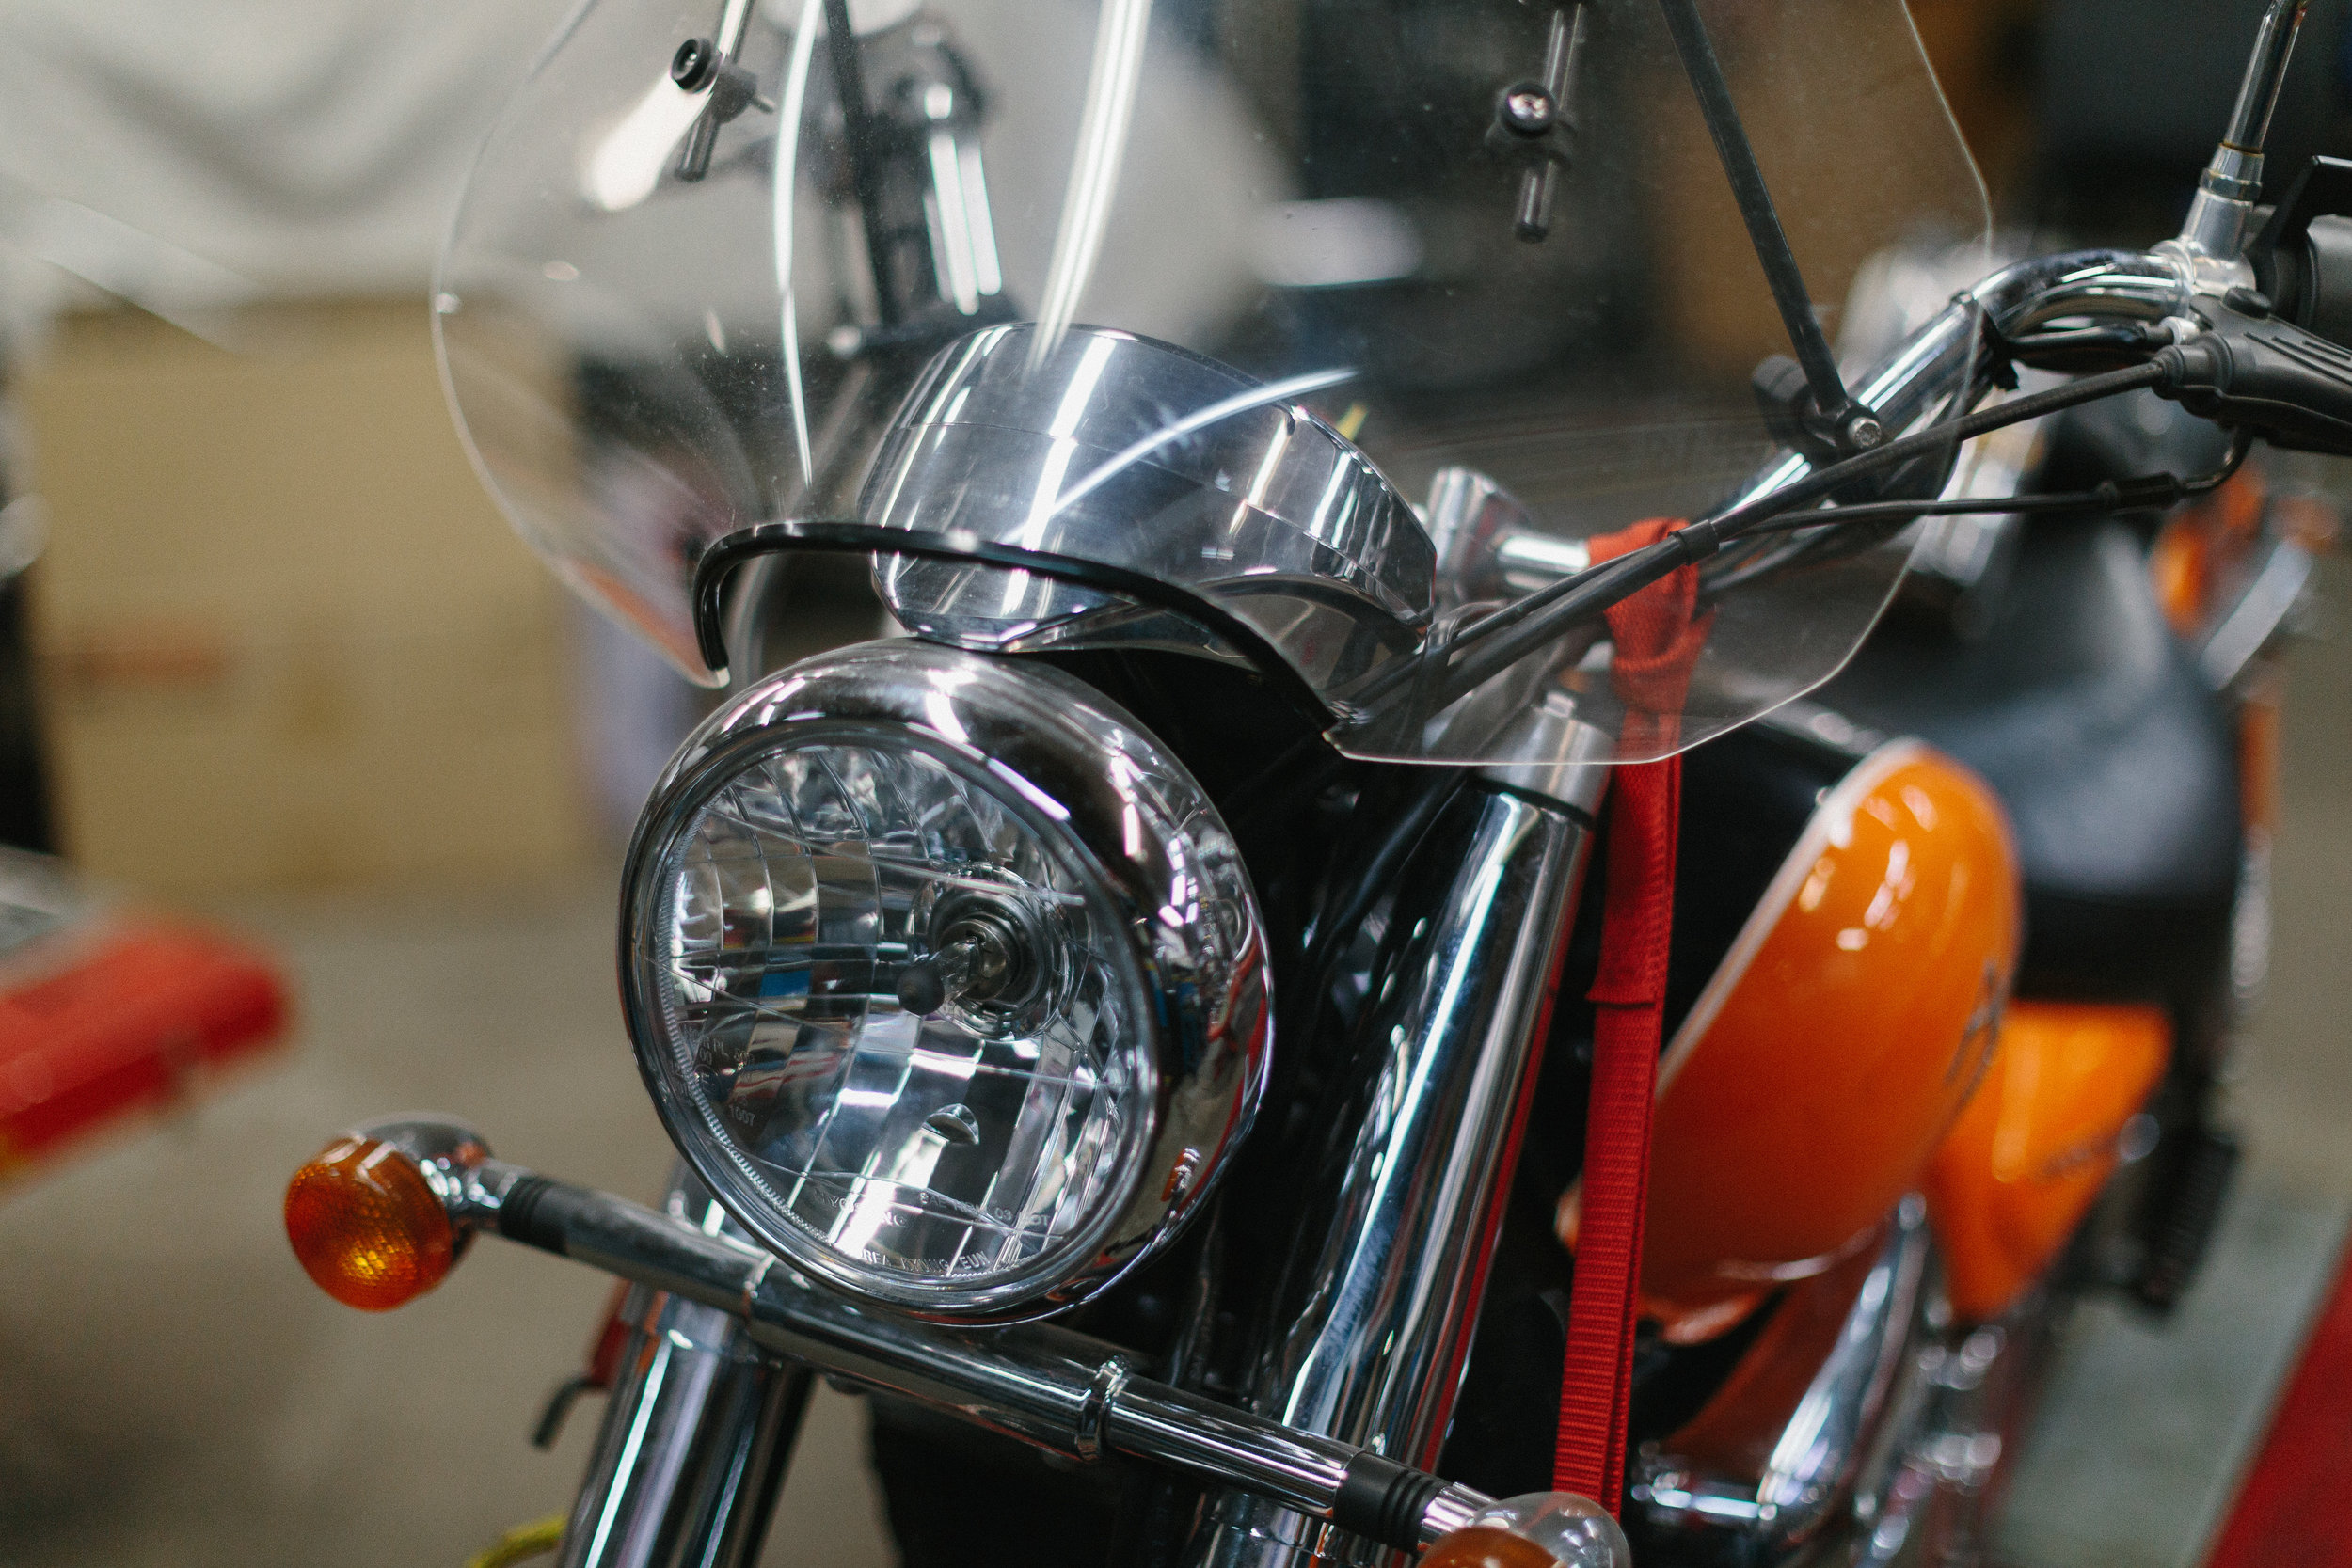 performance-cycle-and-auto-calgary-autobody-mechanic-shop-yyc-40.jpg